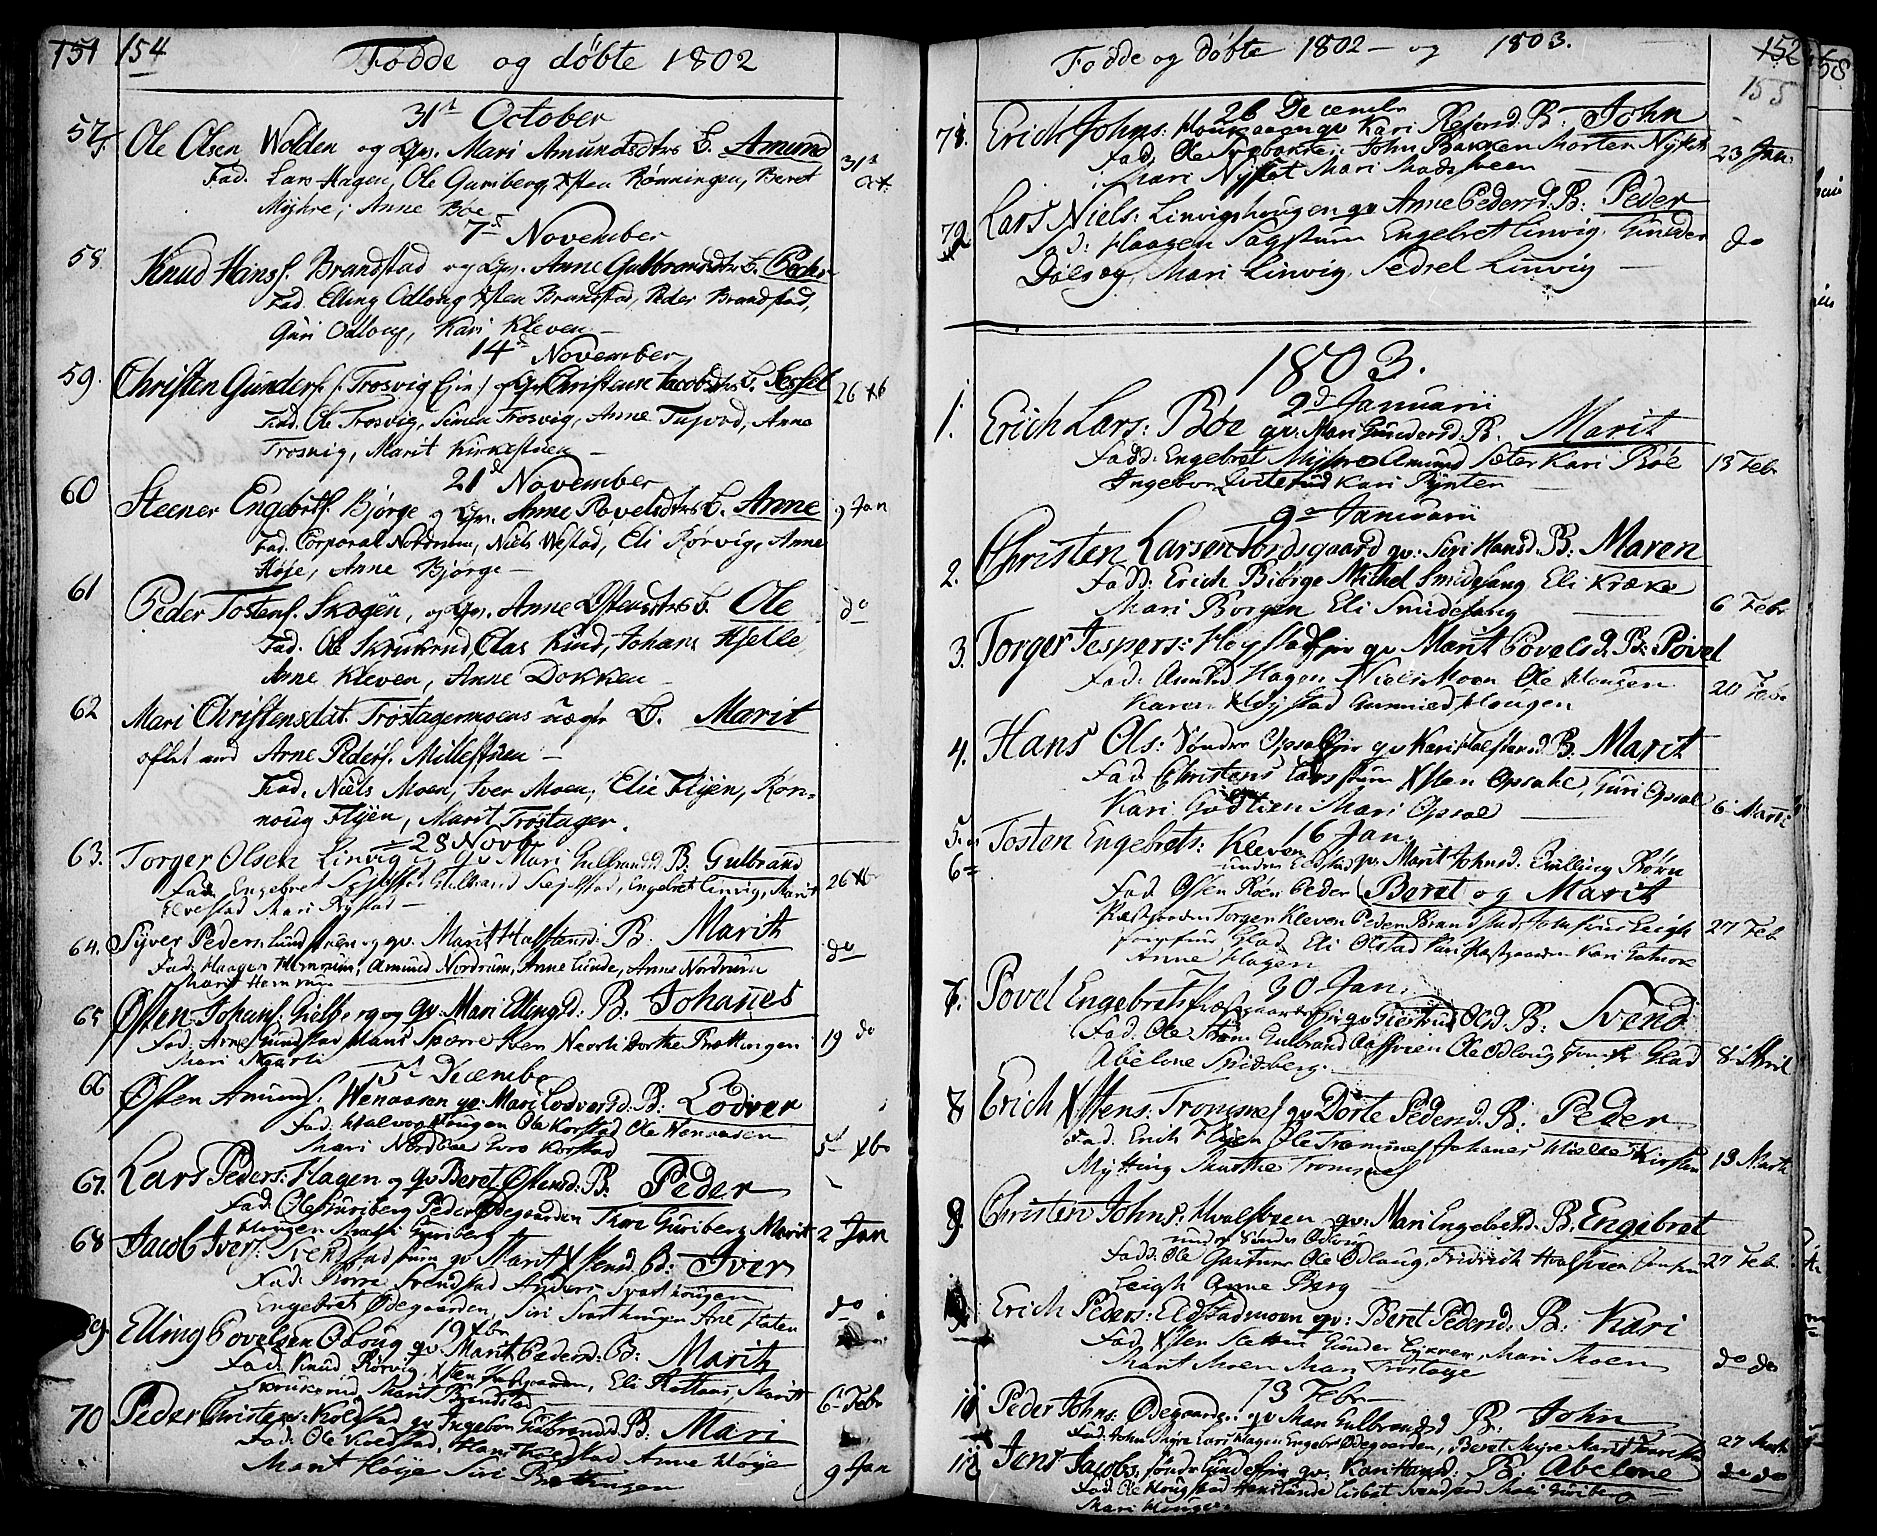 SAH, Ringebu prestekontor, Ministerialbok nr. 3, 1781-1820, s. 154-155